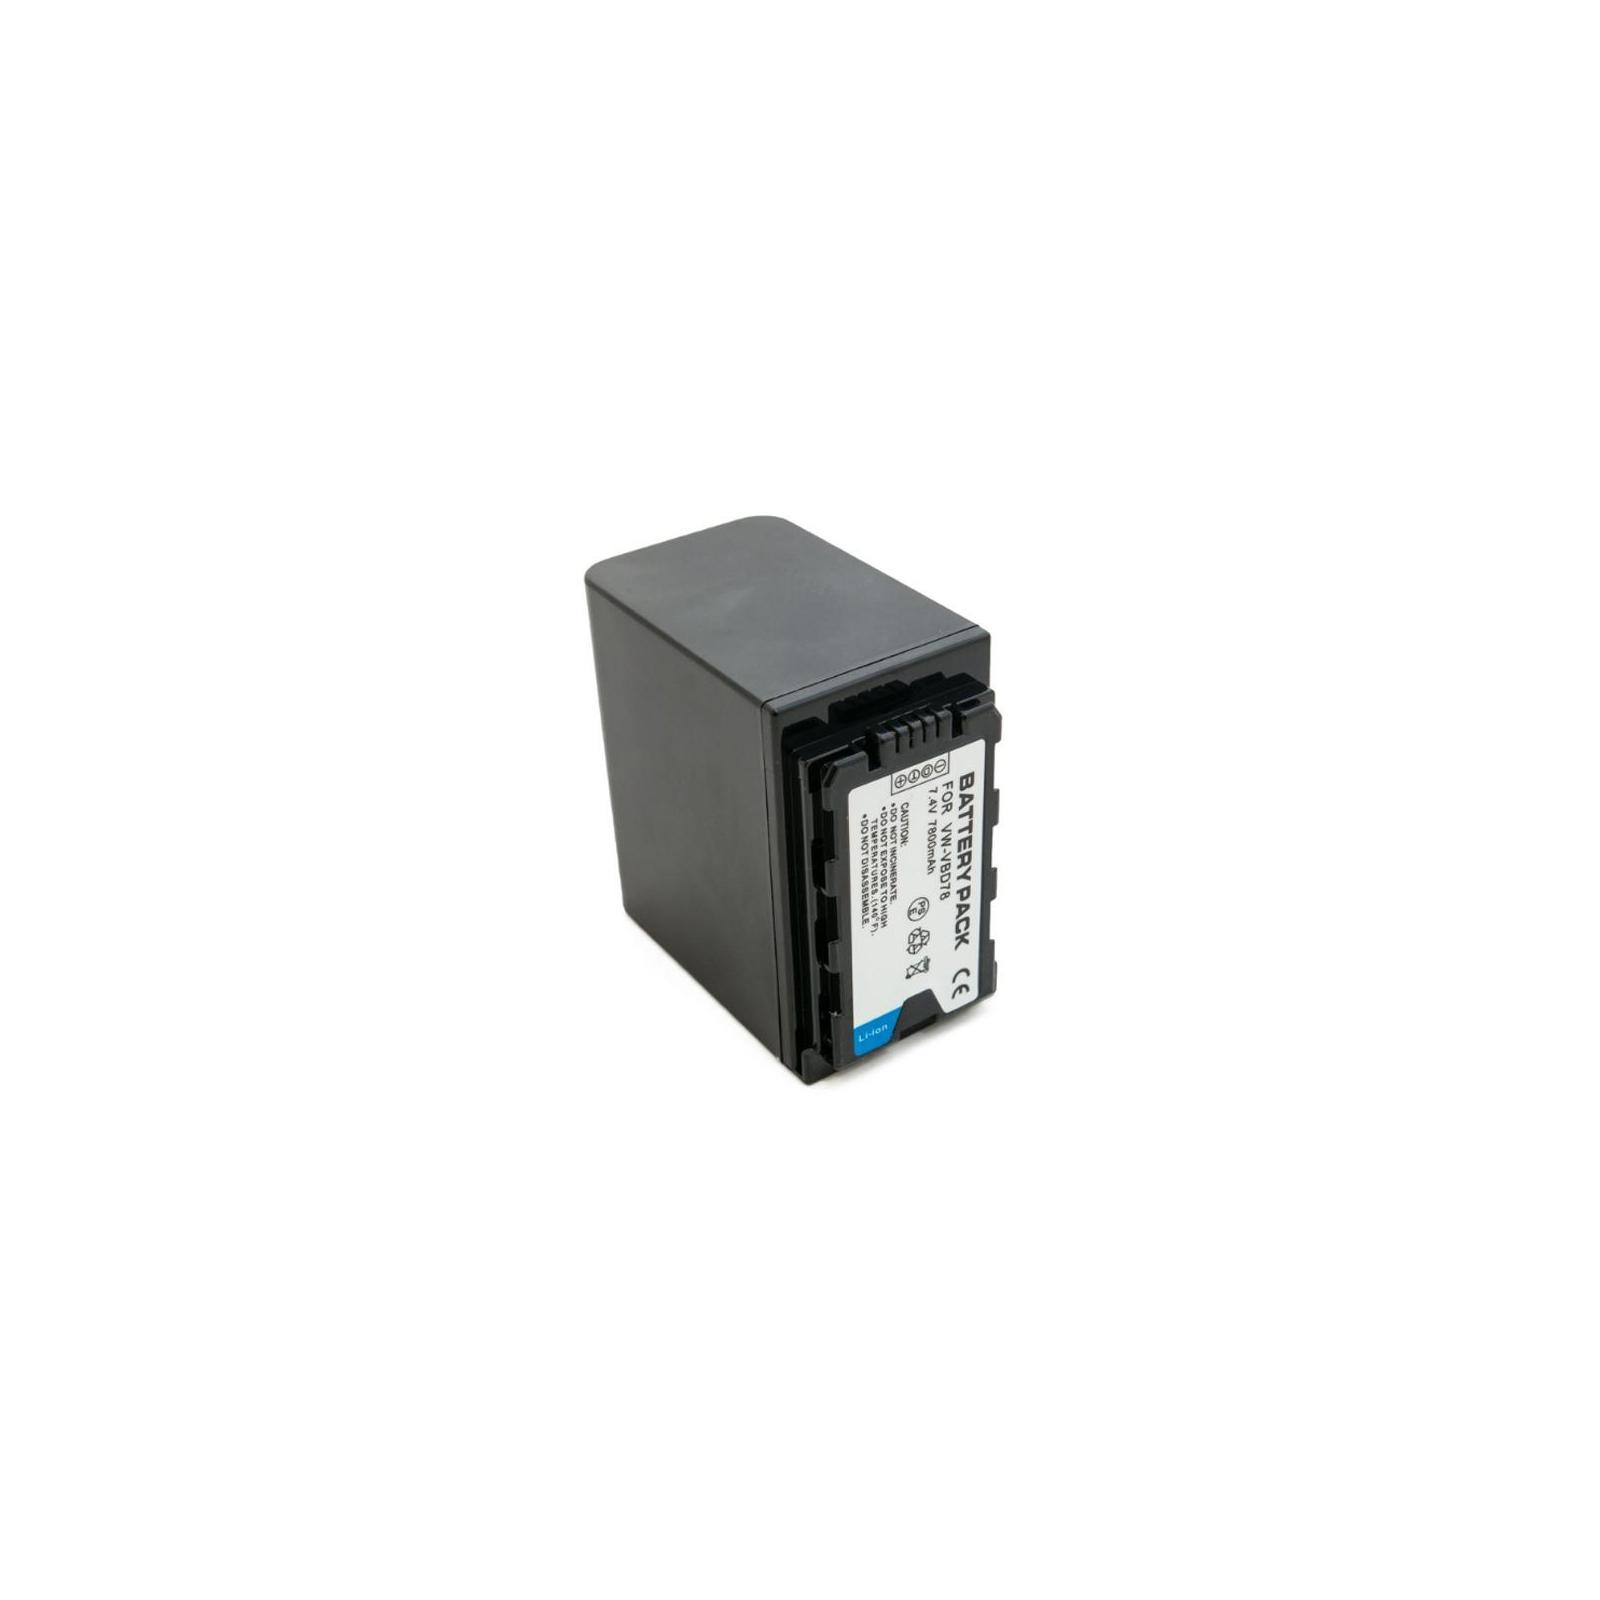 Аккумулятор к фото/видео EXTRADIGITAL Panasonic VW-VBD78, Li-ion, 7.4V, 7800mAh (BDP2694) изображение 4